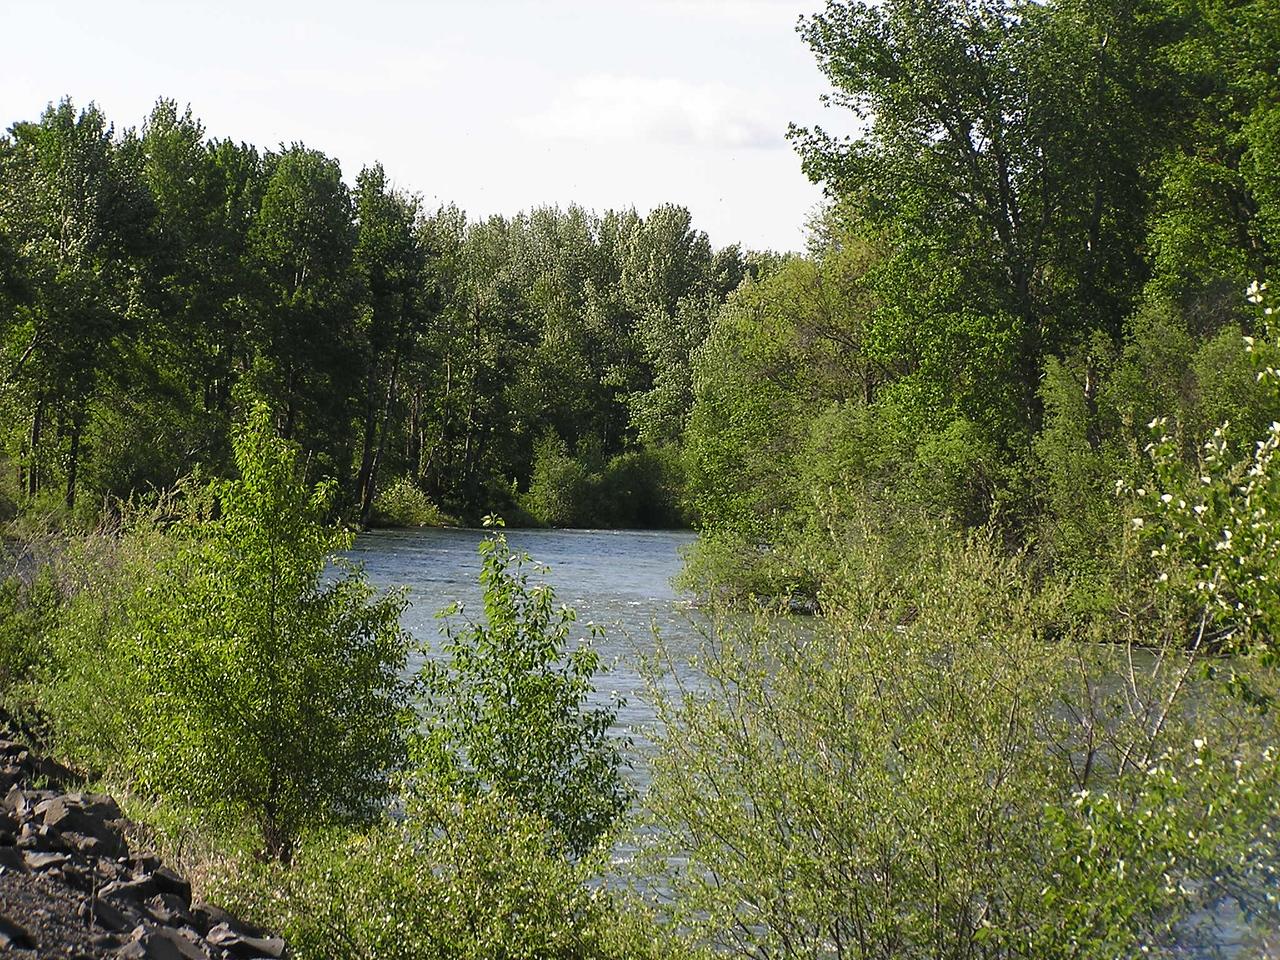 07 05 13 Eburg Riverfront 020